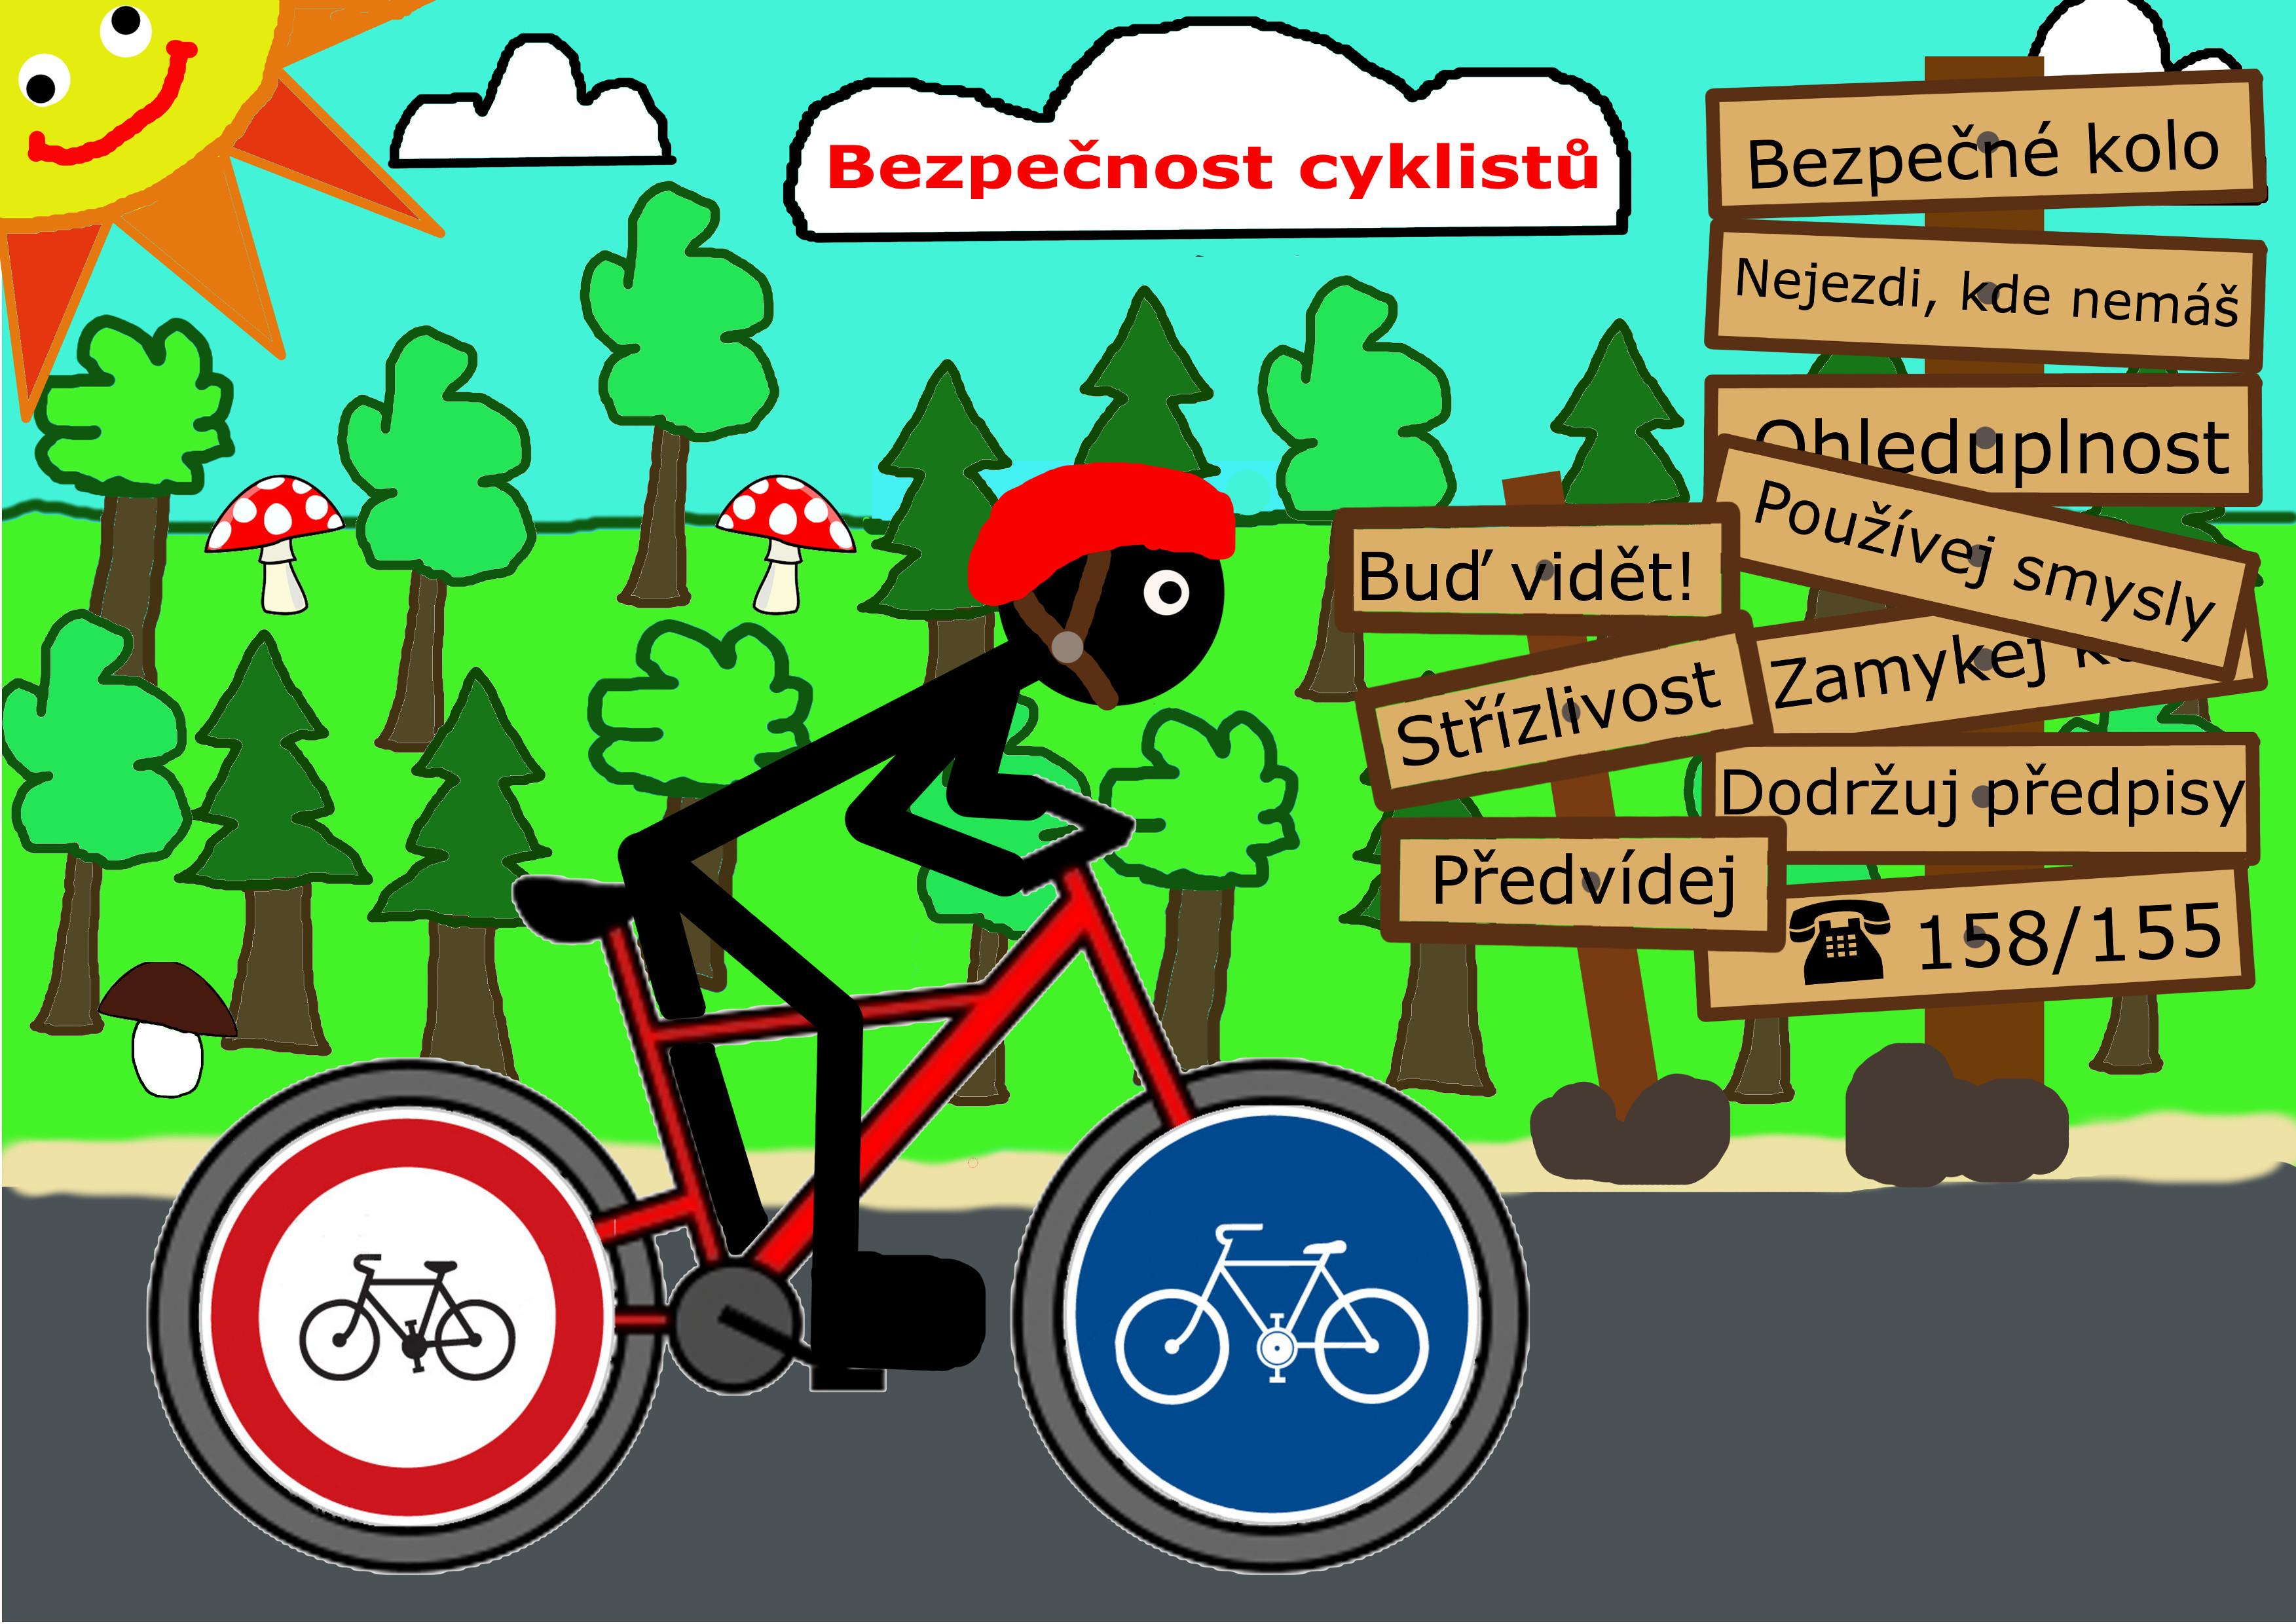 Janderka_bezpecnost_cyklistu